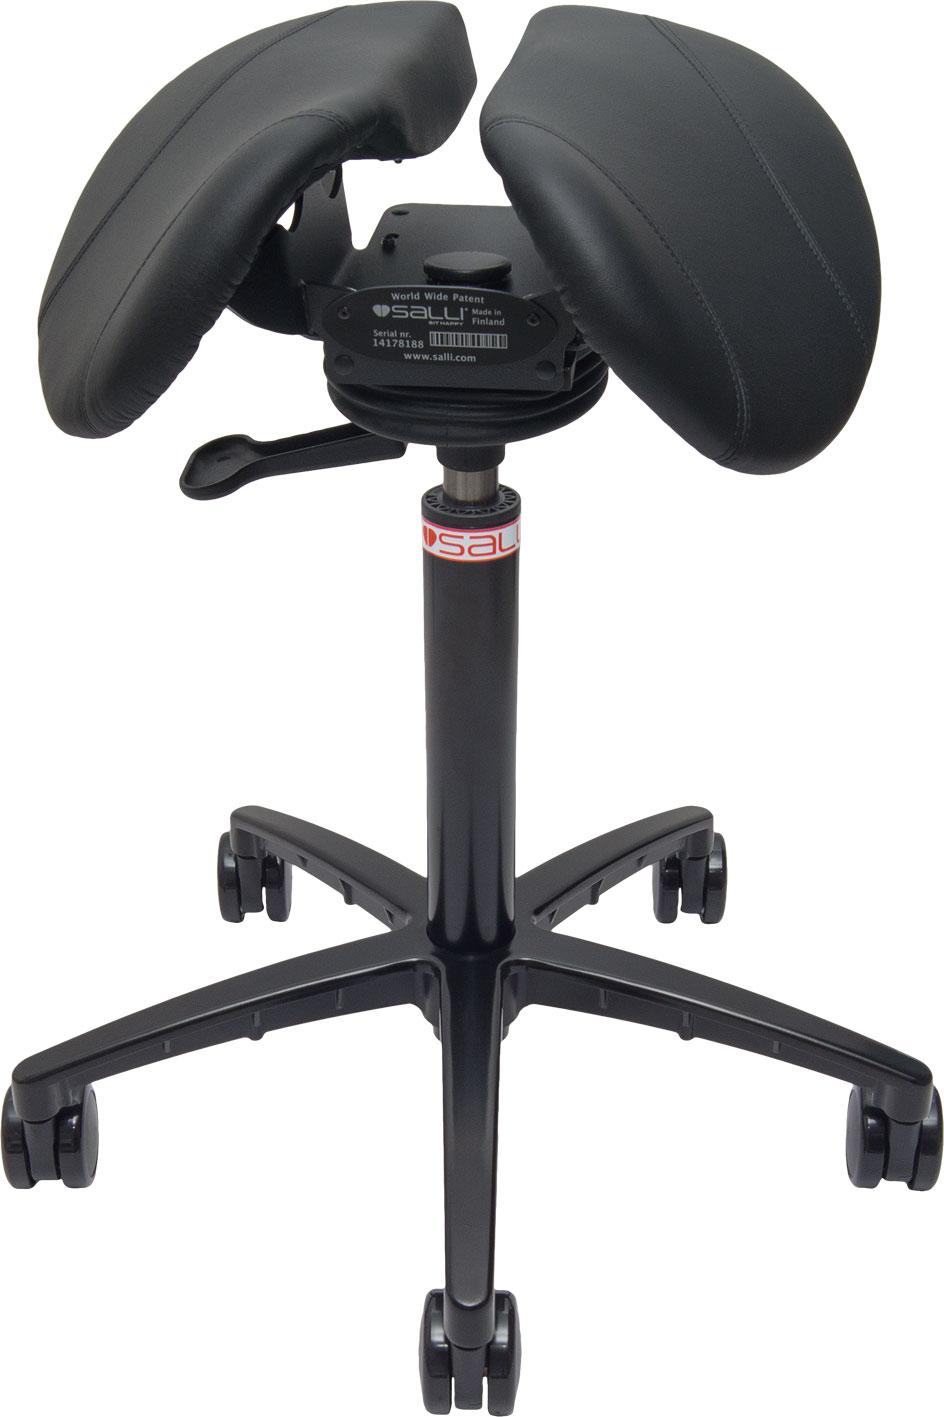 Salli Swing Saddle Chair UK Dealer